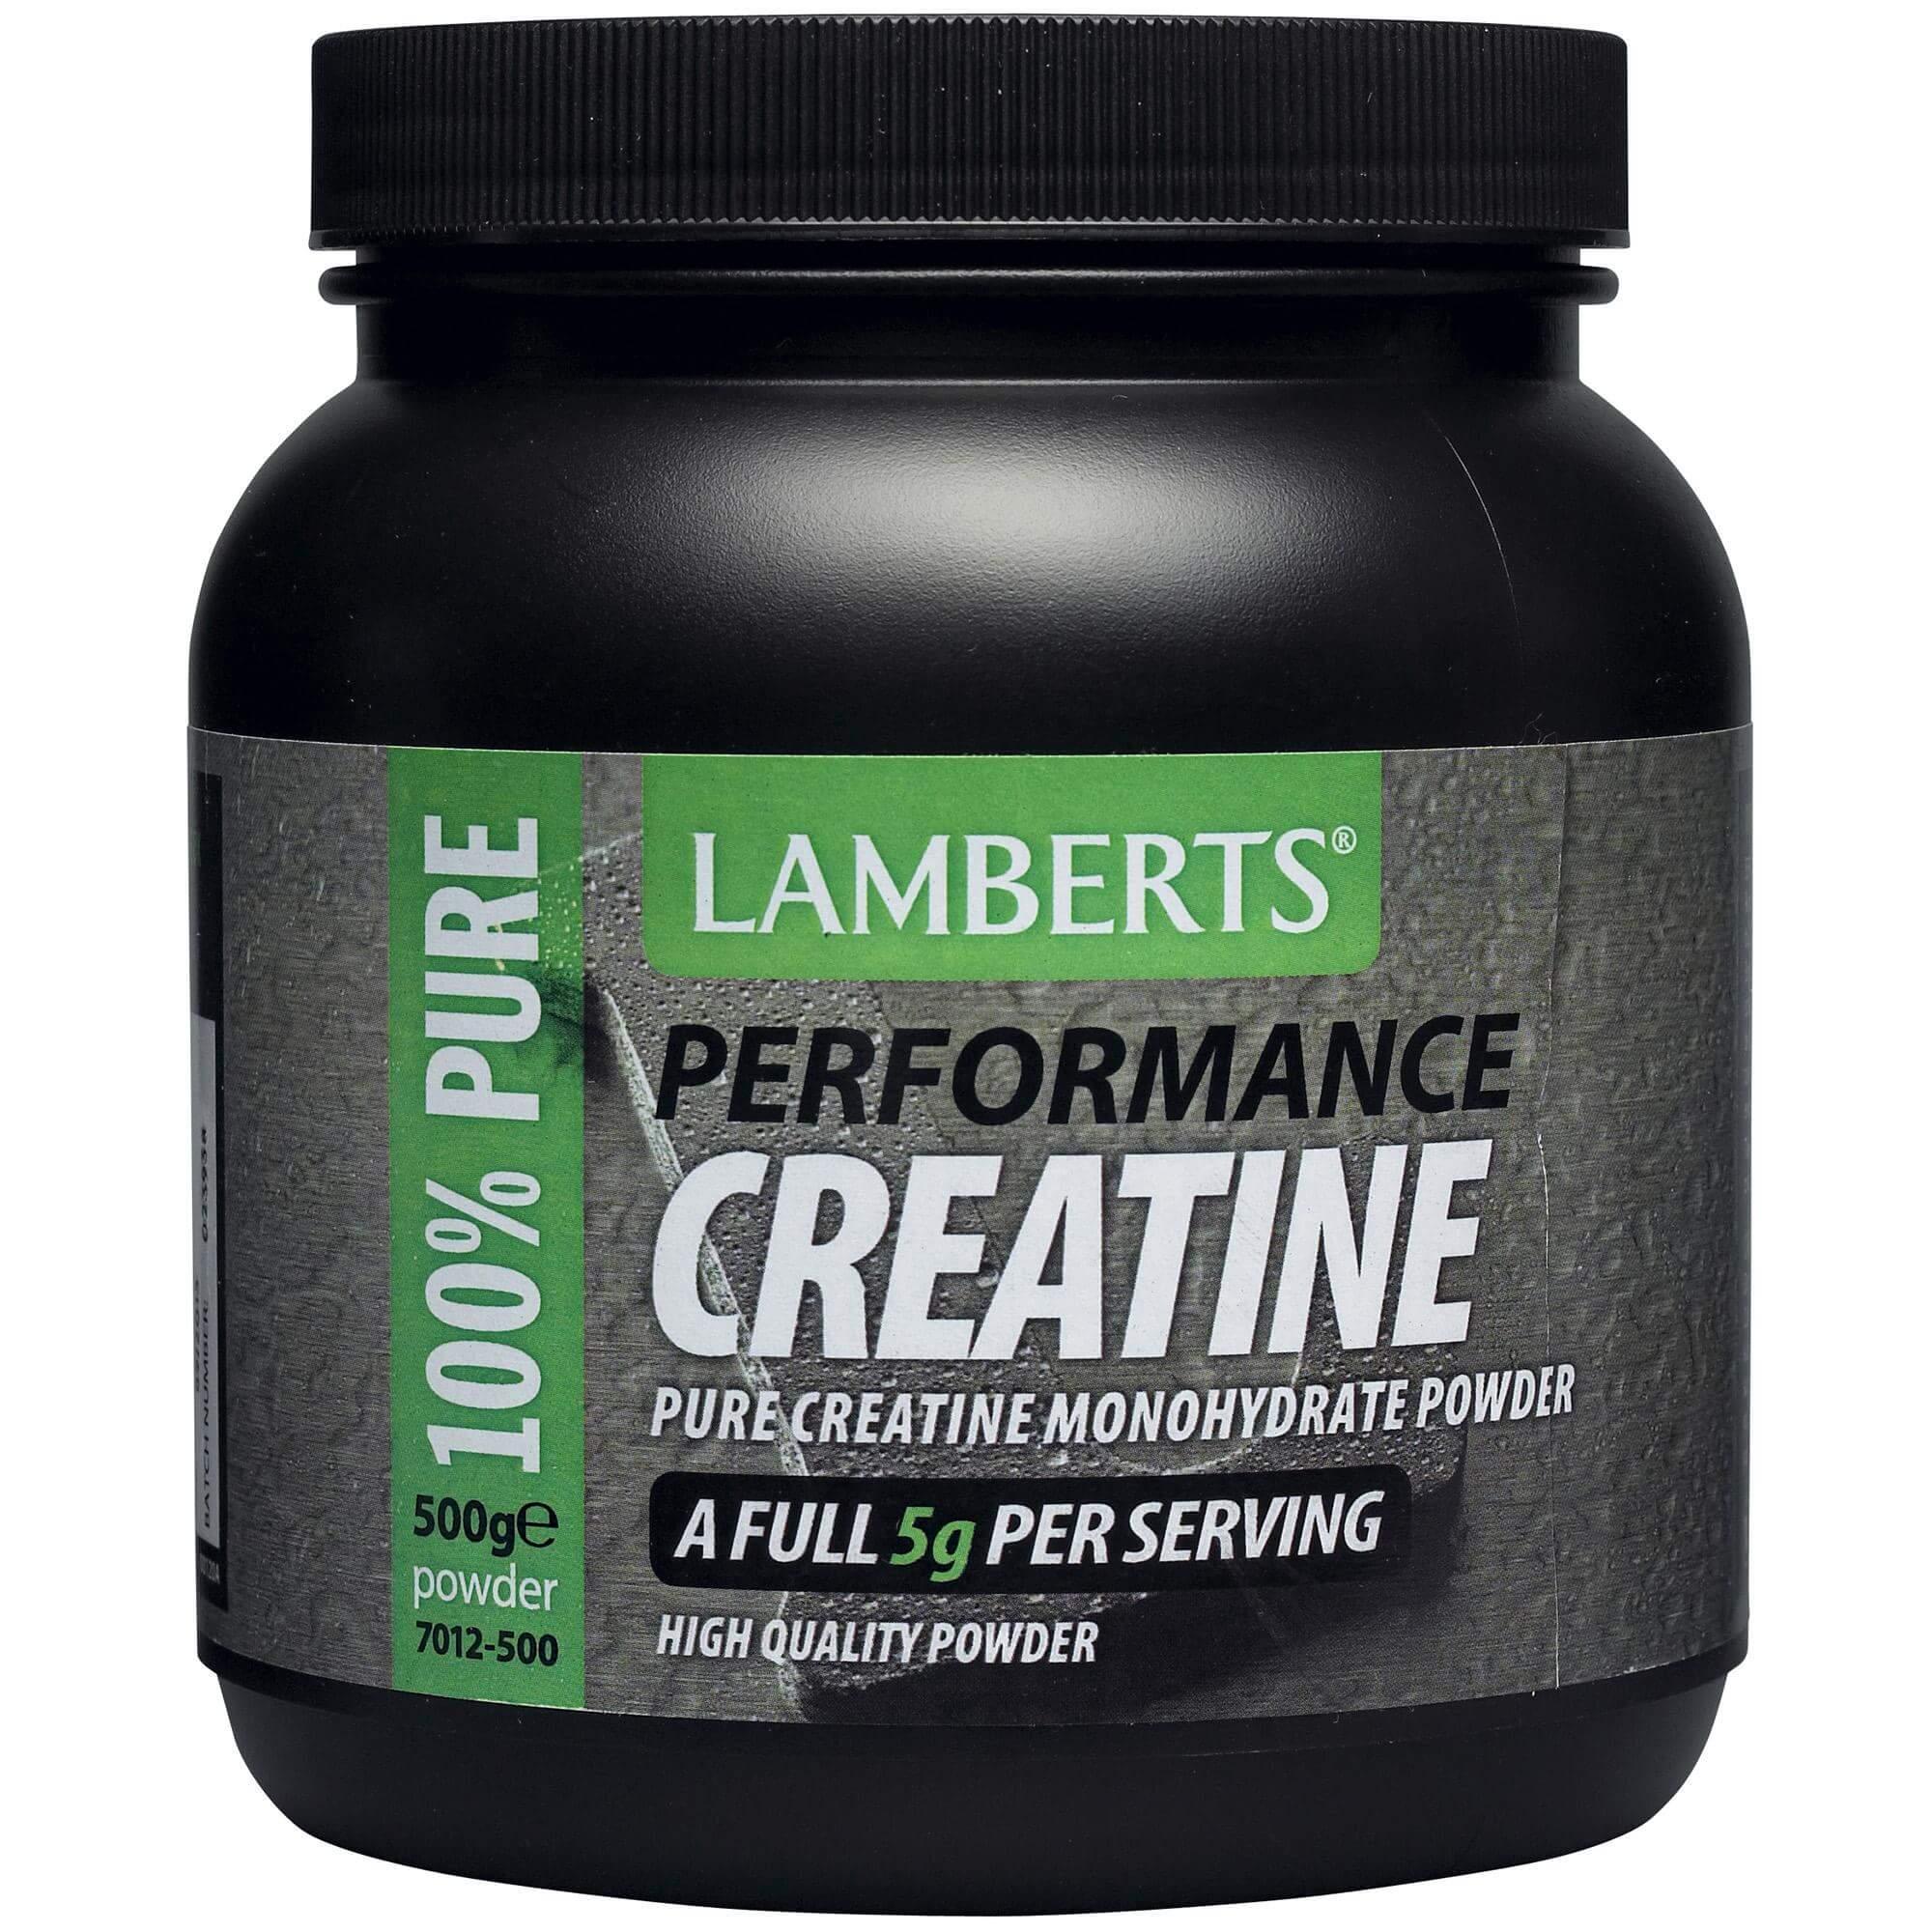 Lamberts Peformance Creatine Συμπλήρωμα Διατροφής Κρεατίνης σε Σκόνη 500gr